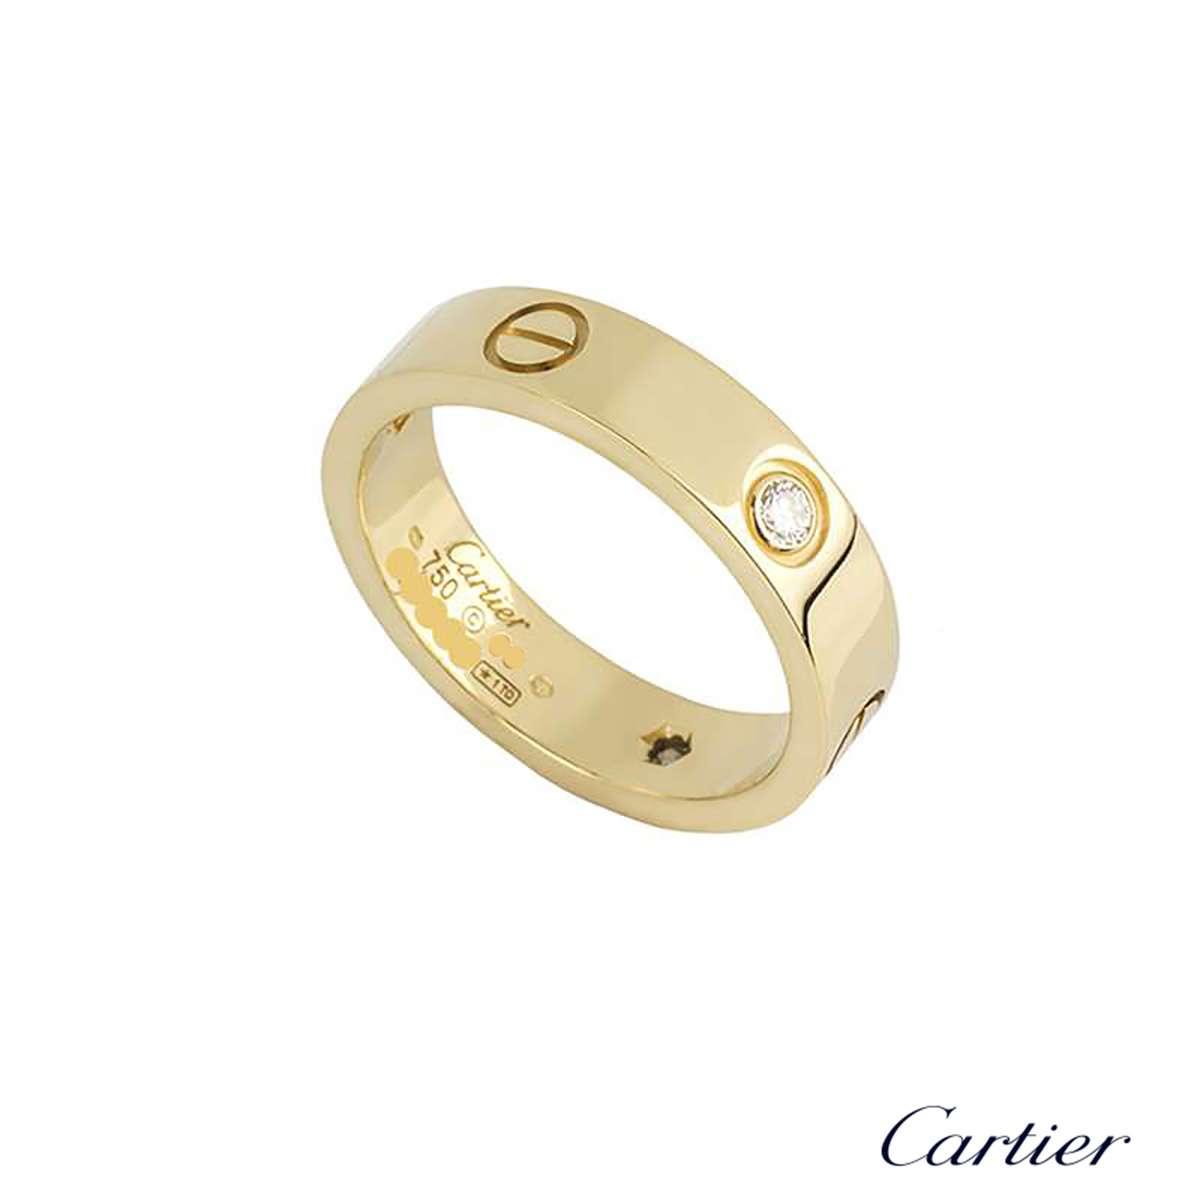 Cartier Yellow Gold Half Diamond Love Ring Size 52B4032452